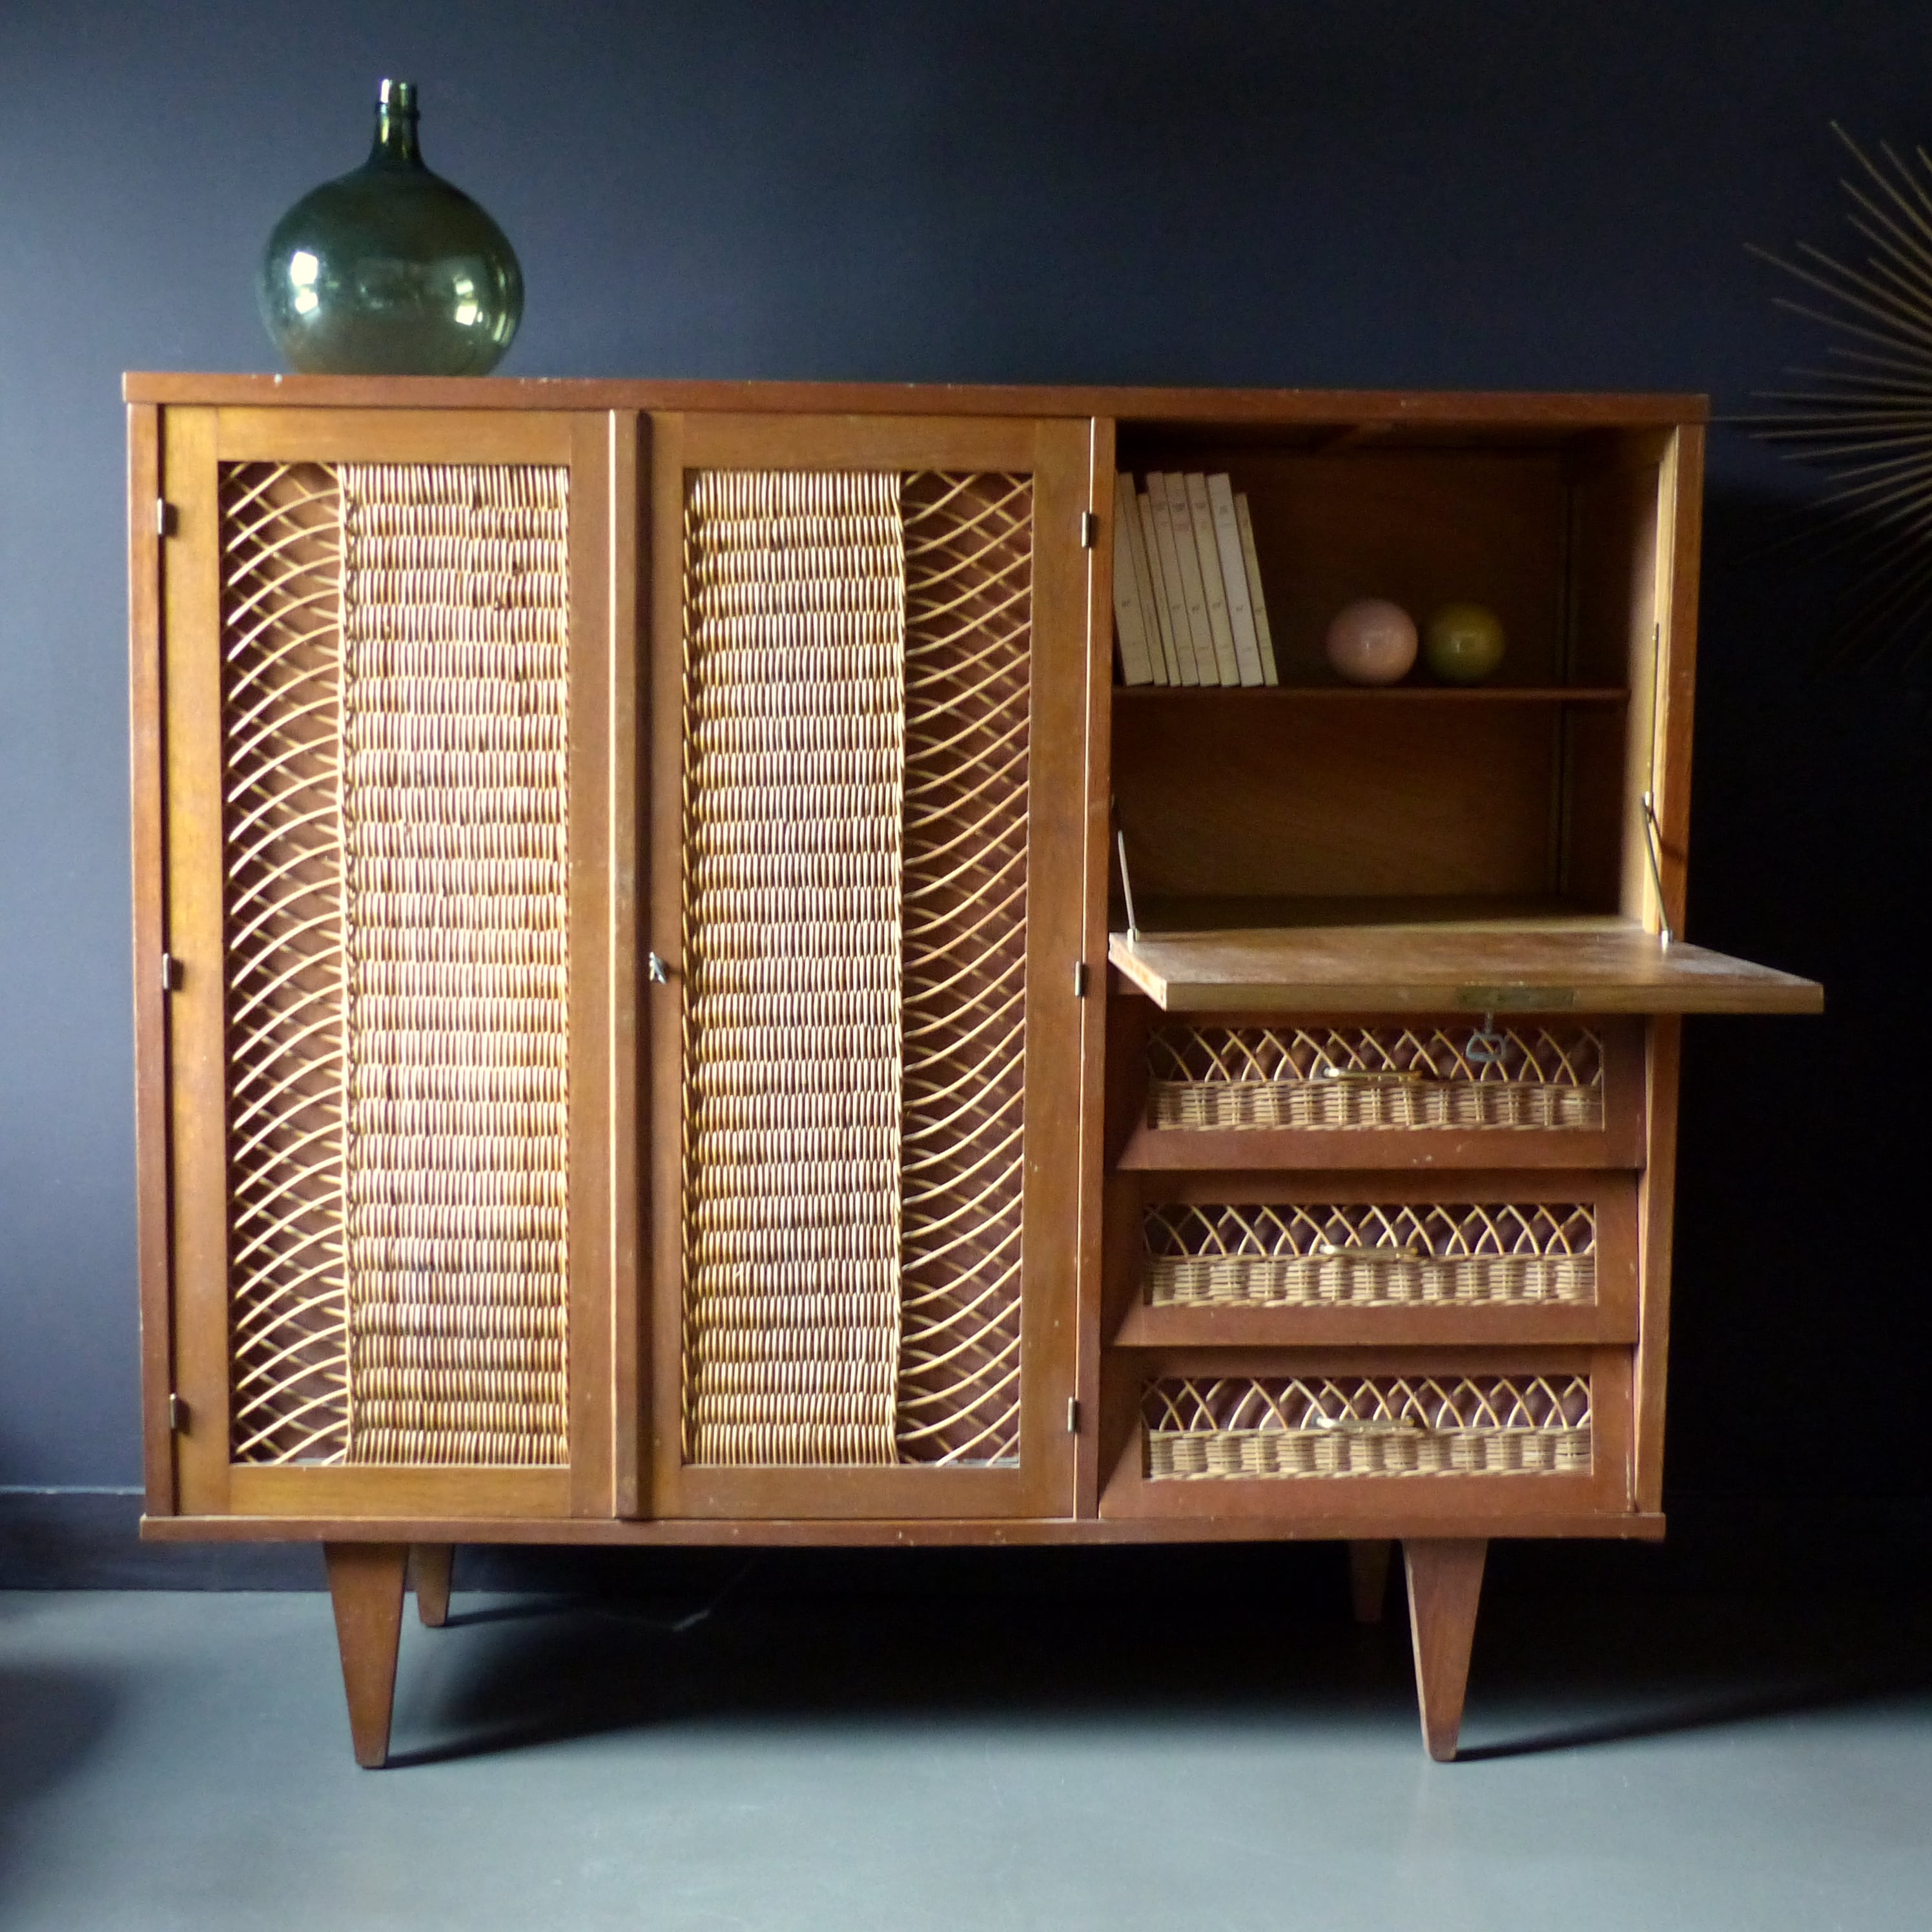 armoire secr taire vintage lignedebrocante brocante en ligne chine pour vous meubles vintage. Black Bedroom Furniture Sets. Home Design Ideas